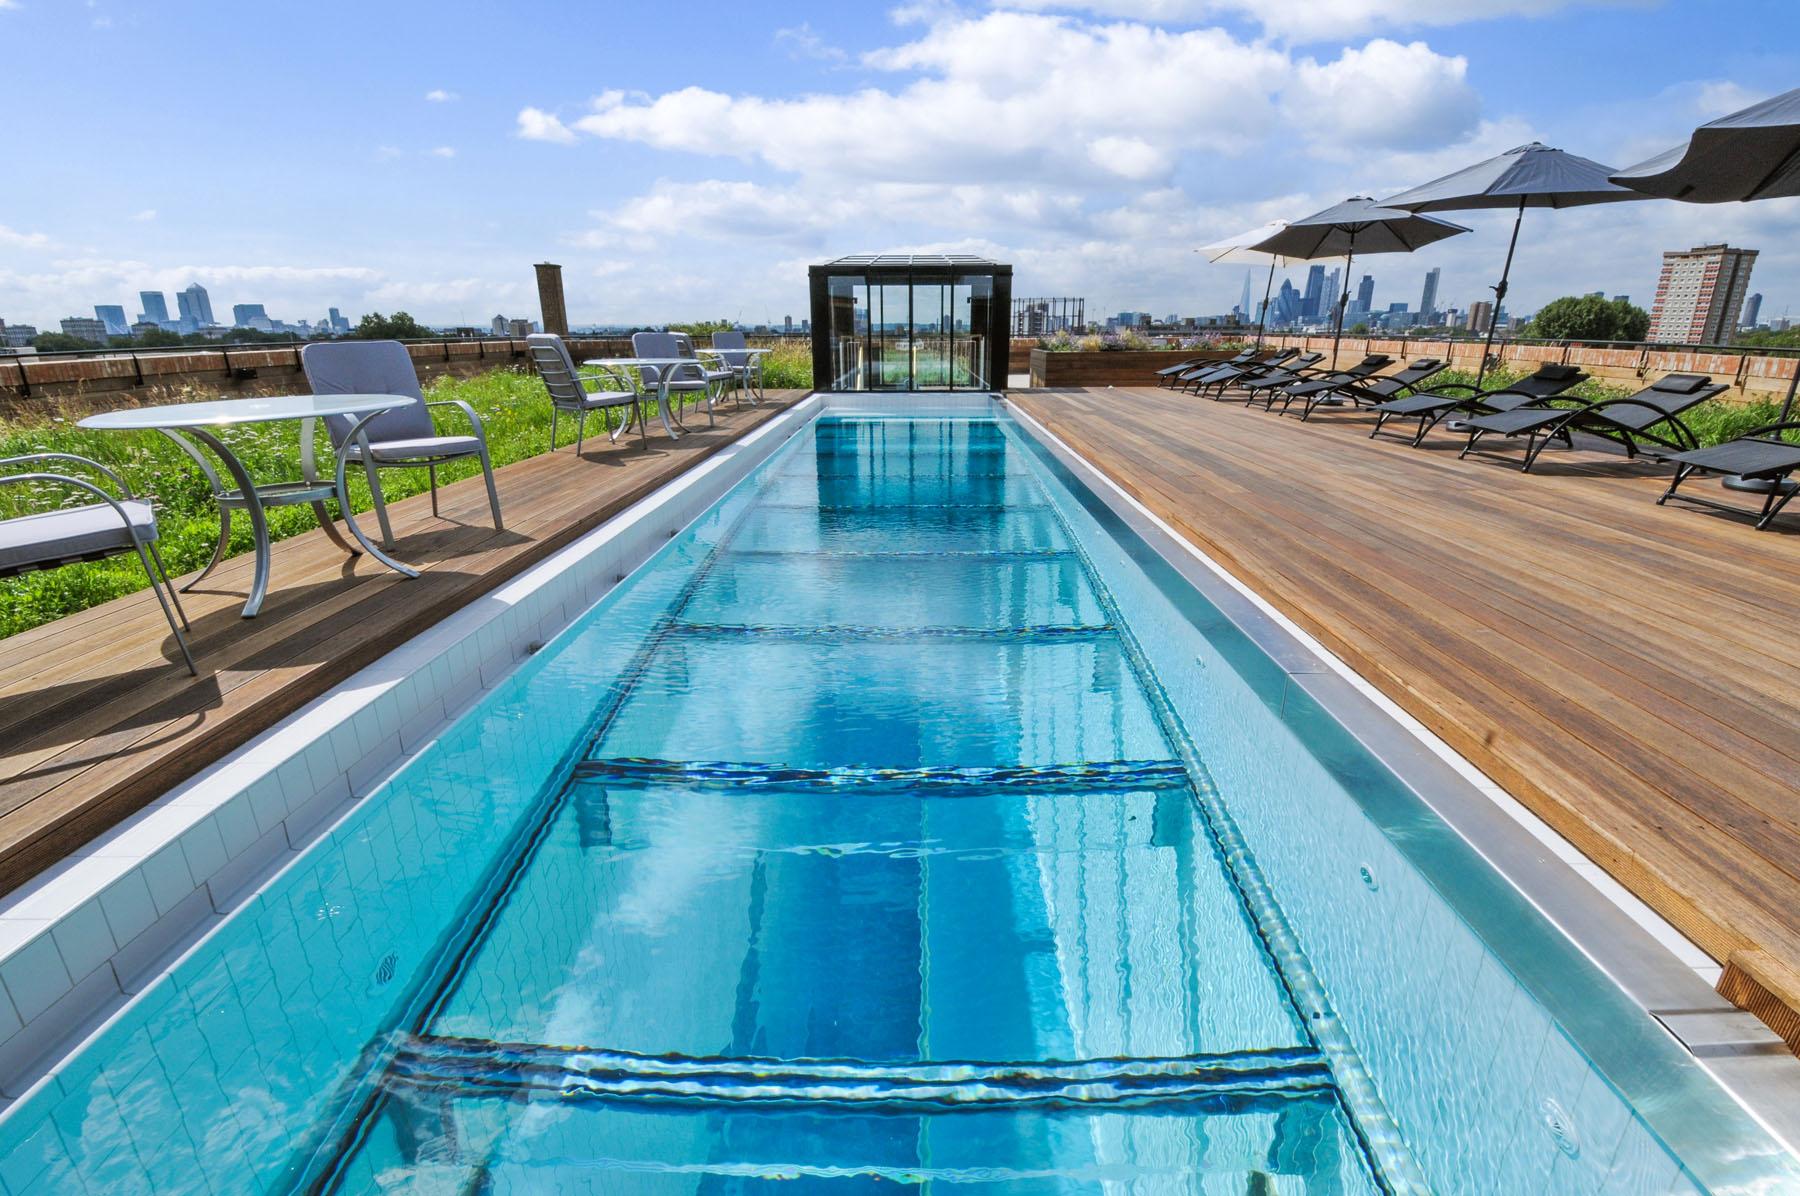 Warehaus,Pool & Sport